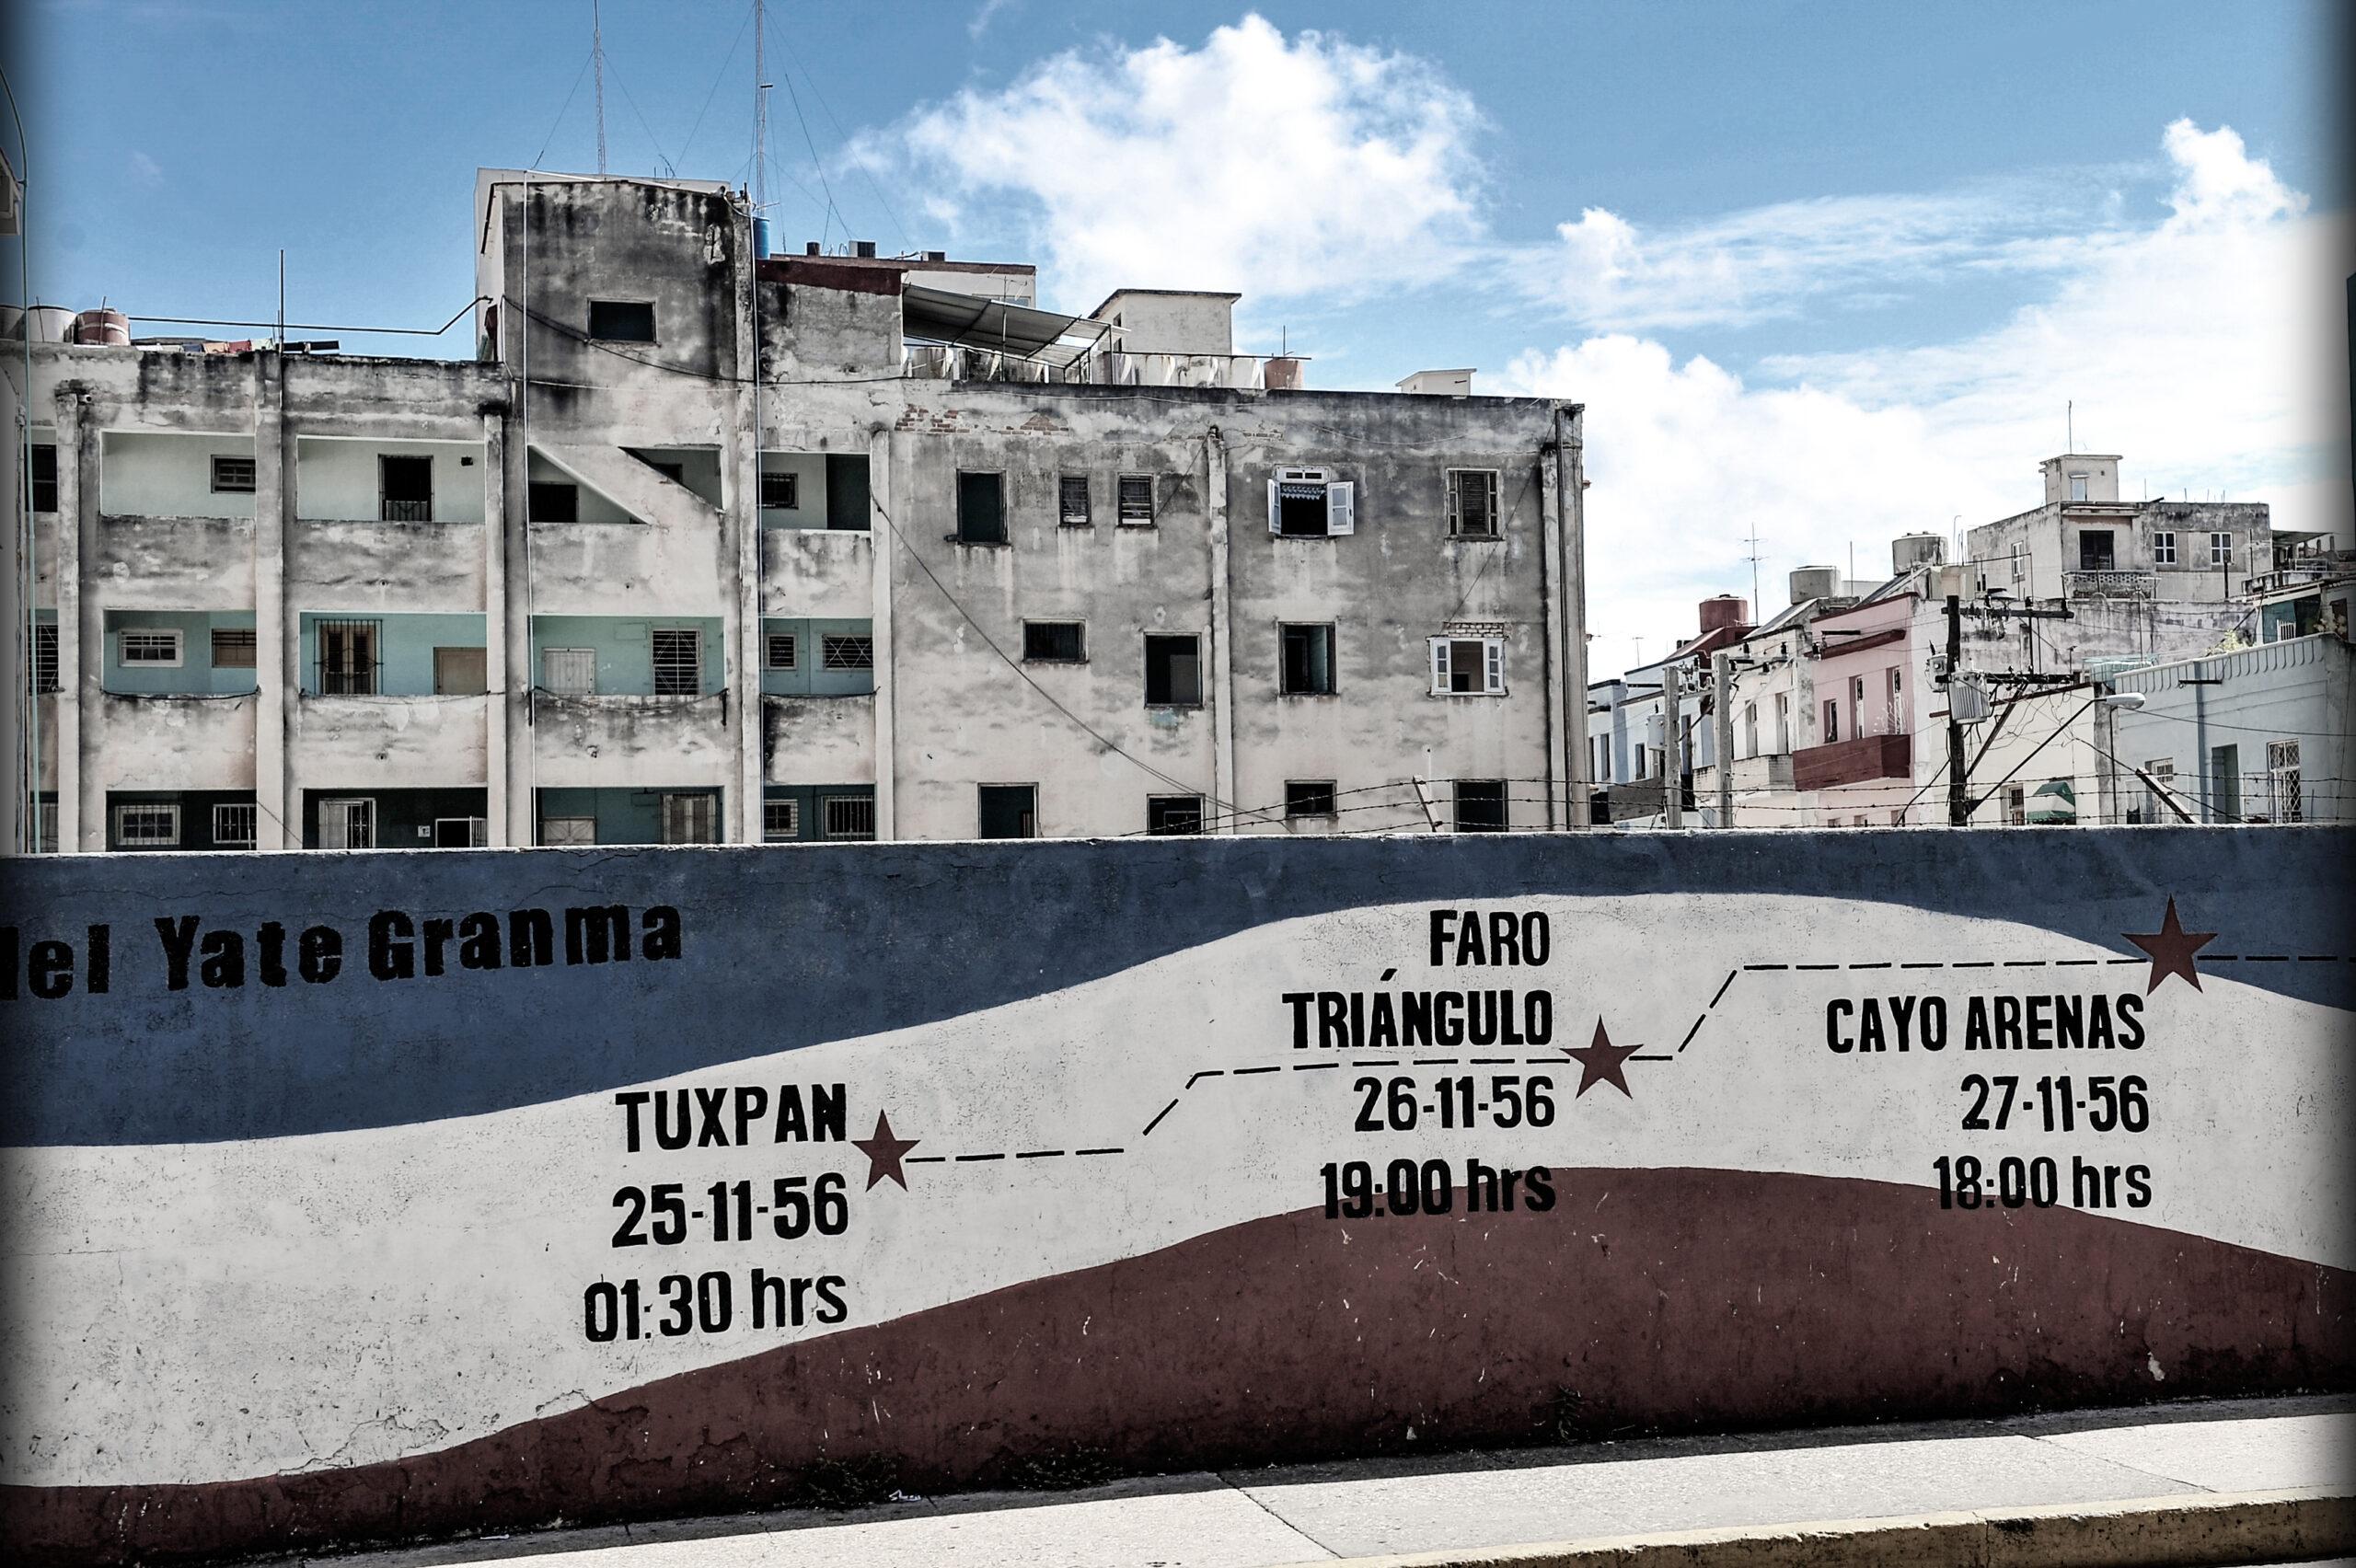 Photographe : Le temps Cubain n°2